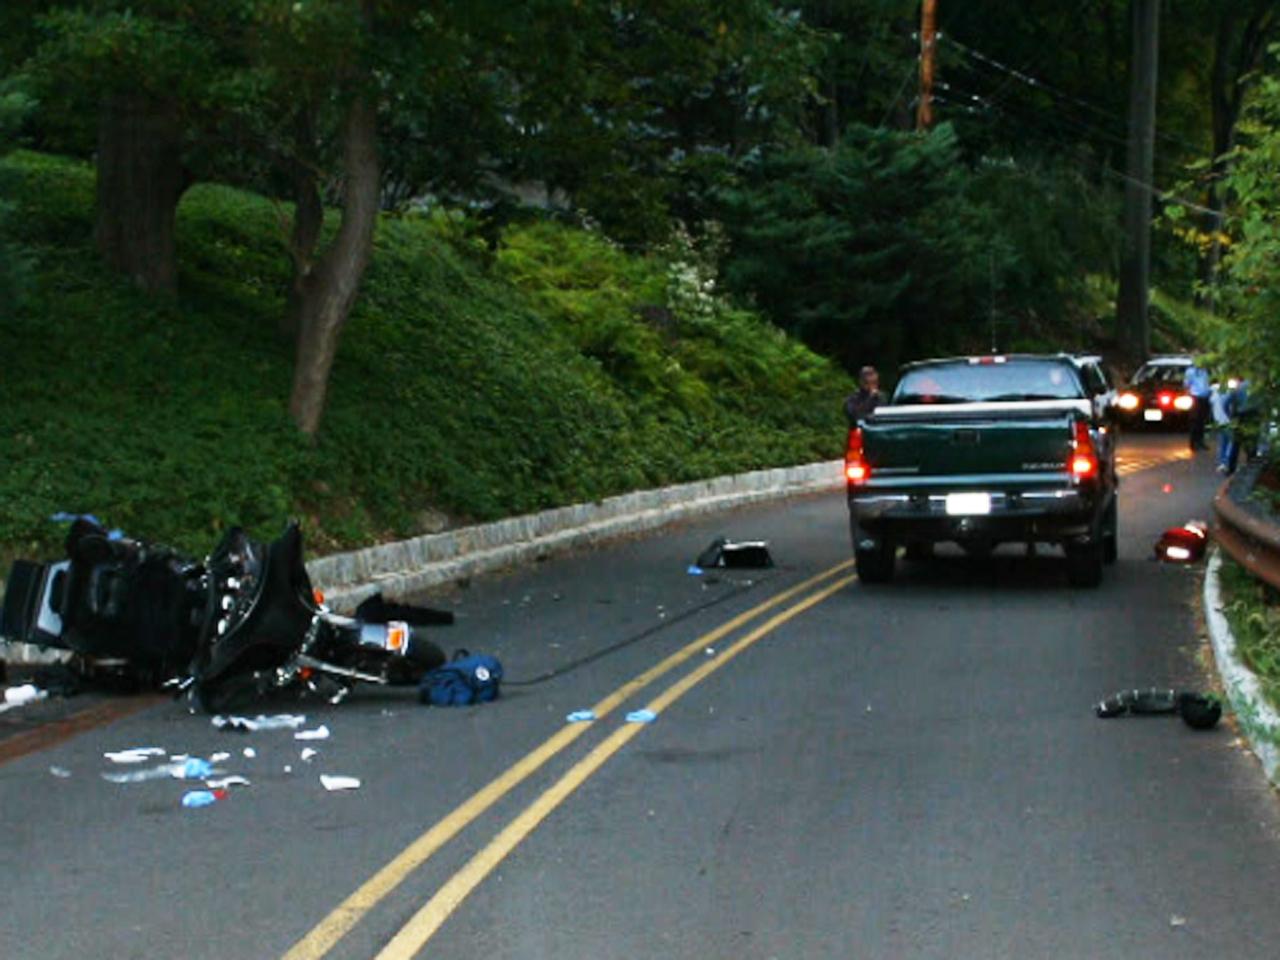 N J  judge: Text sender not liable in car crash - CBS News